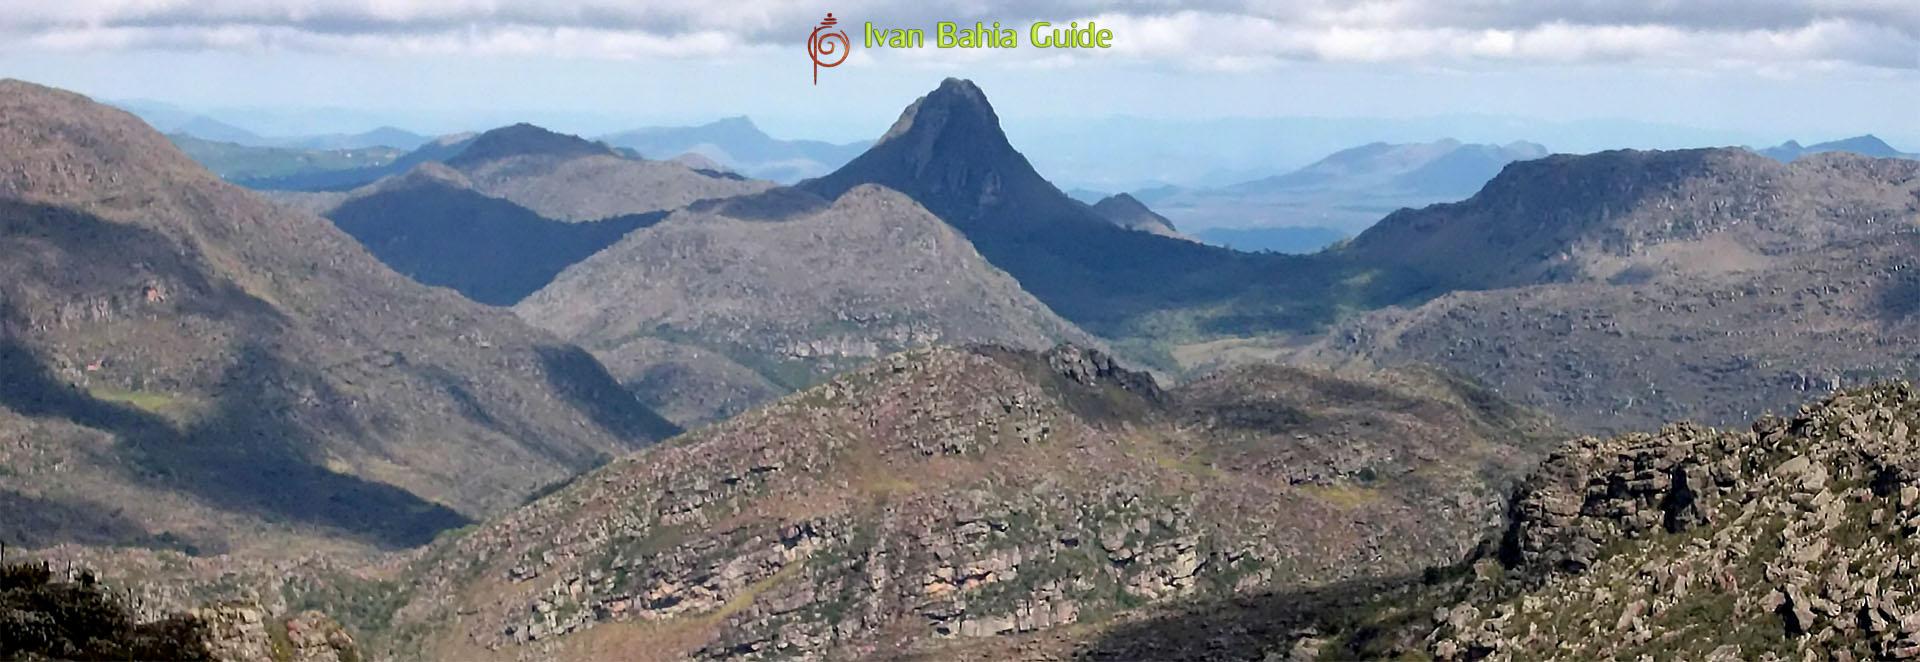 Ivan Bahia & Chapada Diamantina guide / on vous emmène au toit de Bahia à Chapada Diamantina Park national pour un trekking dos 3 picos, aux points les plus hauts du Nord-est/ Bahia (+2000m) avec les pics Barbado, Almas et Itobira / #ibtg #ibg #ivanbahiaguide #ivanbahiatravelguide #zenturturismo #ivanchapadadiamantinaguide #valedopati #patyvalley #pati #viapati #valecapao #ivanchapadaguide #chapadadiamantinatransfer #chapadatrekking #chapadaroots #chapadasoul #lencoisbahia #chapadadiamantinatrekking #ivanchapadadiamantinaguide  #chapadadiamantinaguide  #guidechapadadiamantina #lencois #lençois #chapadaadventuredaniel #diamondmountains #zentur # #guiachapadadiamantina #chapadaaventure #discoverchapada #chapadadiamond #chapadasoul #diamantinatrip  #tripadvisor #bahiametisse, #fernandobingre, #ivansalvadorbahia #salvadorbahiaTravel #toursbylocals #fotosbahia #bahiafotos #chapadadiamantinanationalpark #yourtoursbrazil #maurotours #bahiatopturismo #bahiapremium #maisbahiaturismo #fernandobingretourguide #cassiturismo